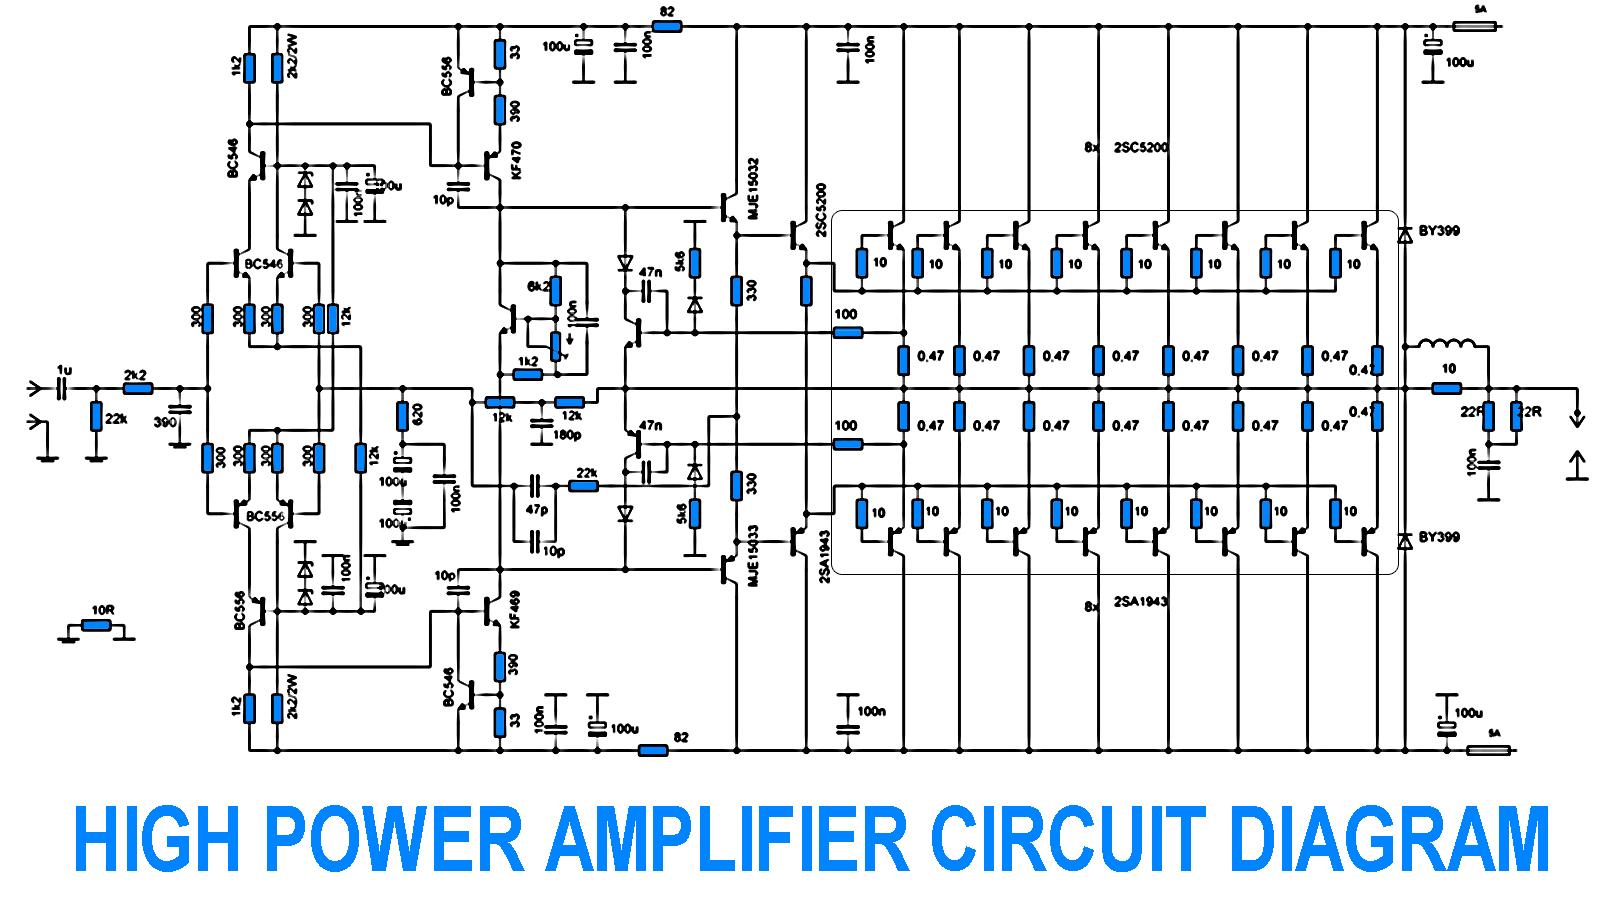 Pioneer Power Amplifier Circuit Diagram Just Another Wiring Audiocircuit Seekiccom D Rudiant Rh Wirerudian Blogspot Com Audio